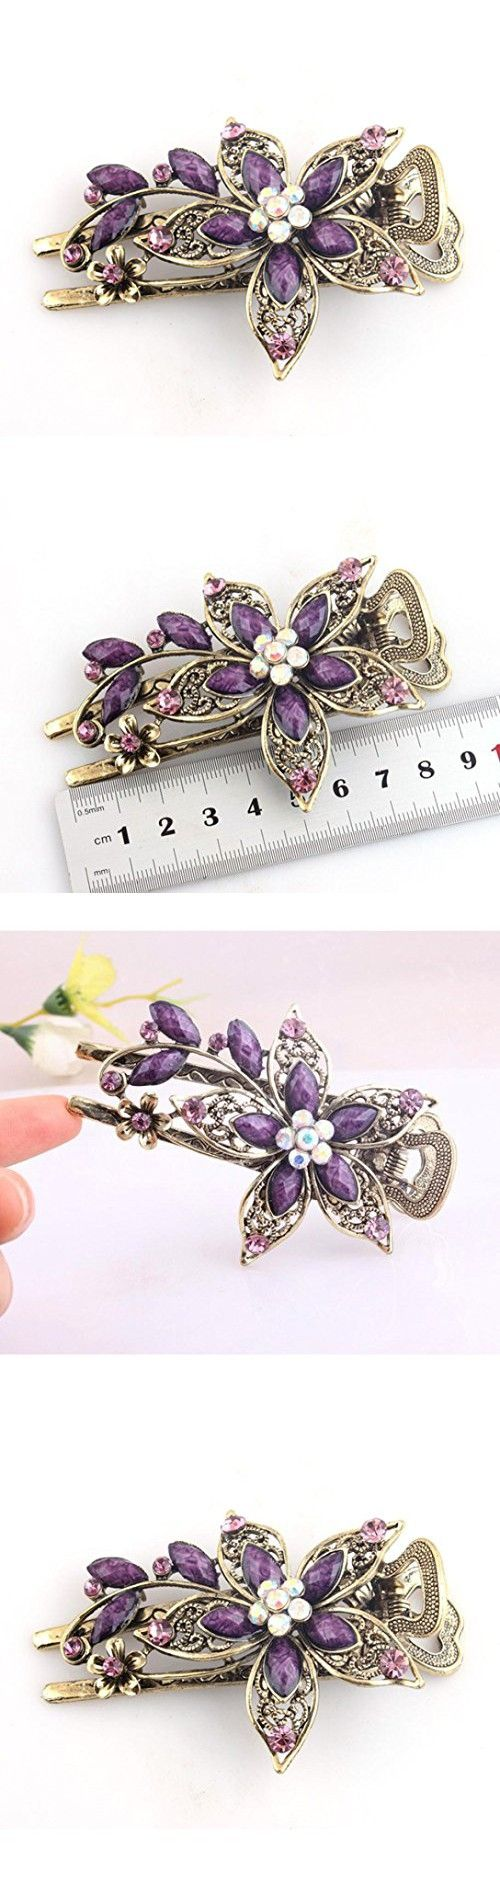 Tinksky Hair Clips Hair Pin Bridal Hair Accessories Wedding Crystal Decor Hair Comb Clip(Purple)